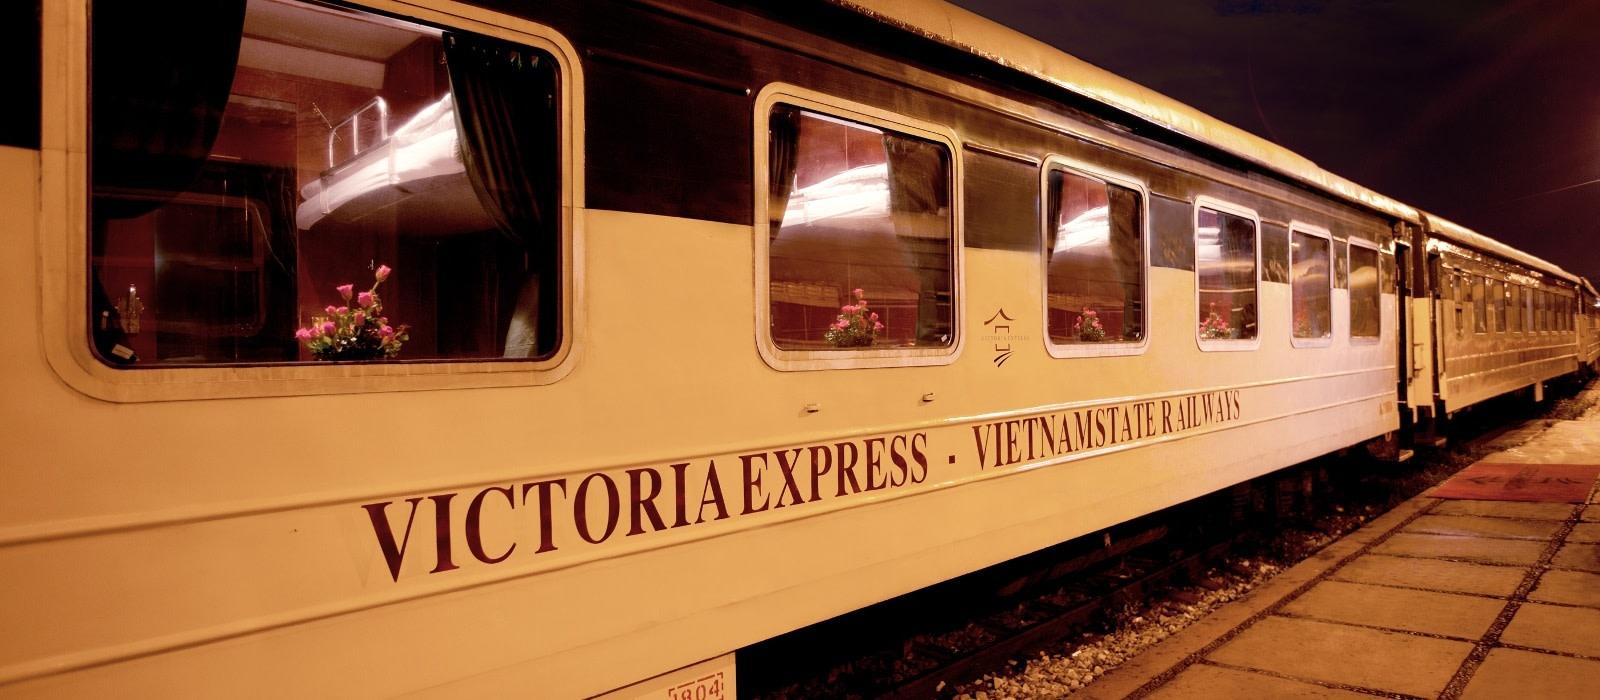 Hotel Victoria Express Train (Hanoi – Laocai) Vietnam